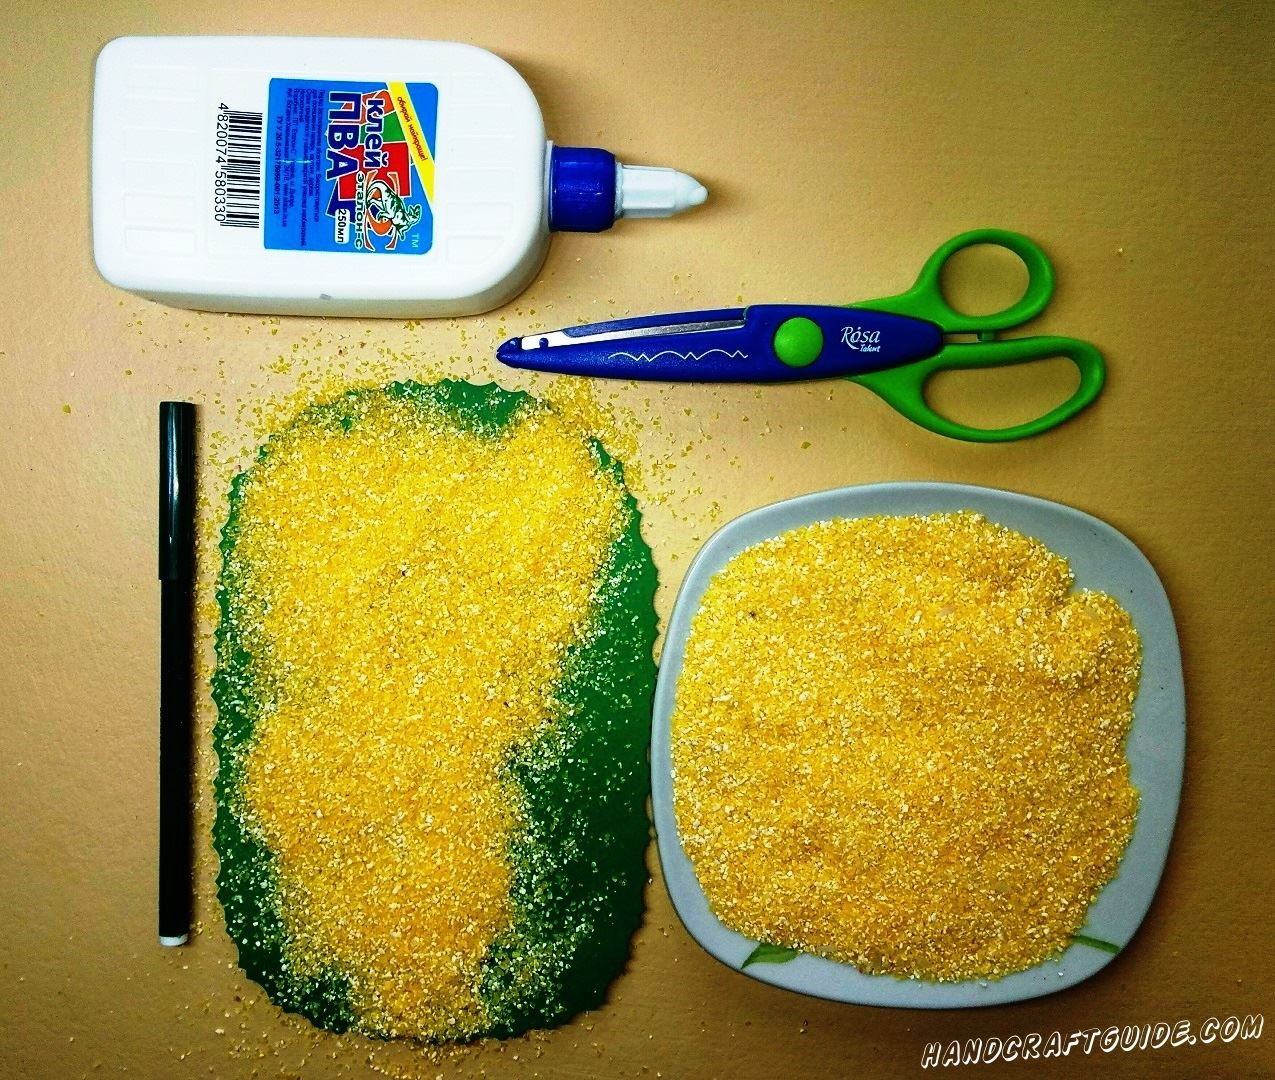 Засыпаем кукурузной крупой аппликацию